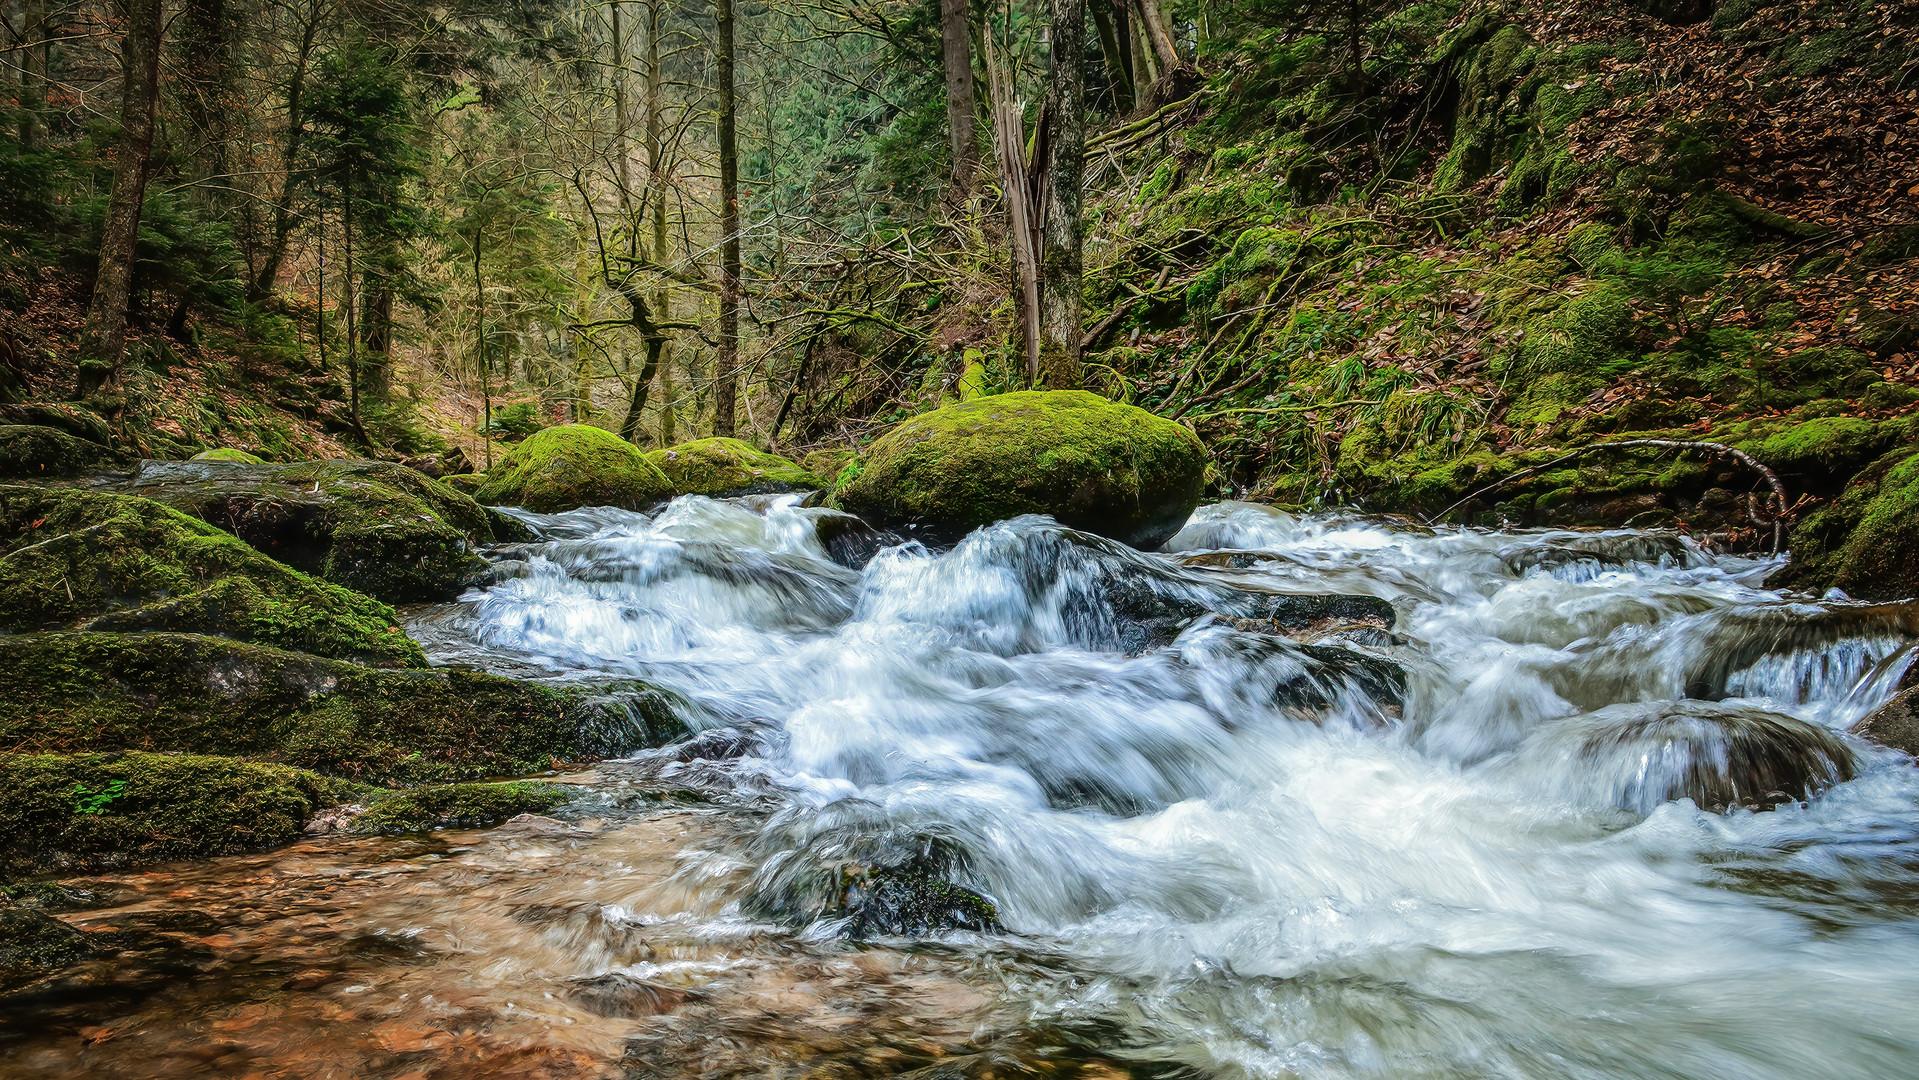 Geroldsauer Wald